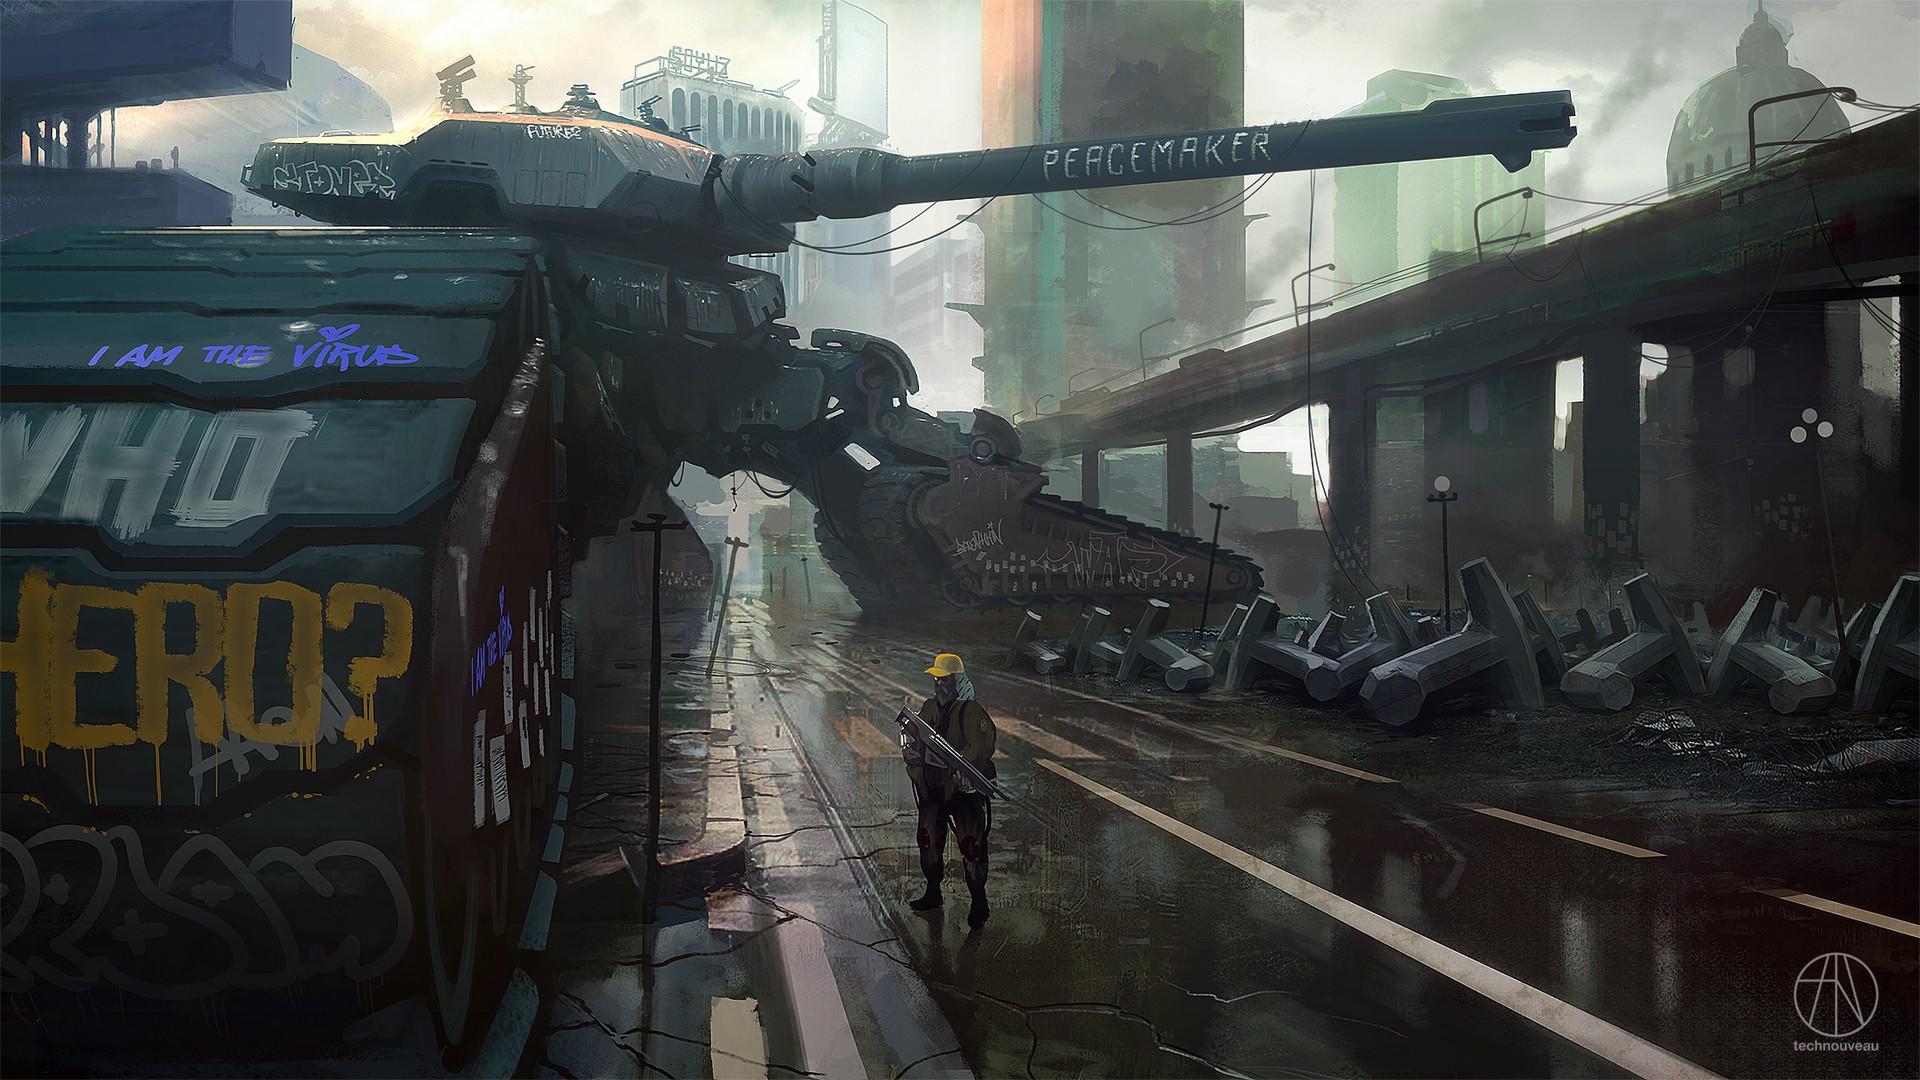 Wallpaper City Futuristic Weapon Artwork Soldier Tank Science Fiction Concept Art Graffiti Games Screenshot Pc Game 1920x1080 85175 Hd Wallpapers Wallhere